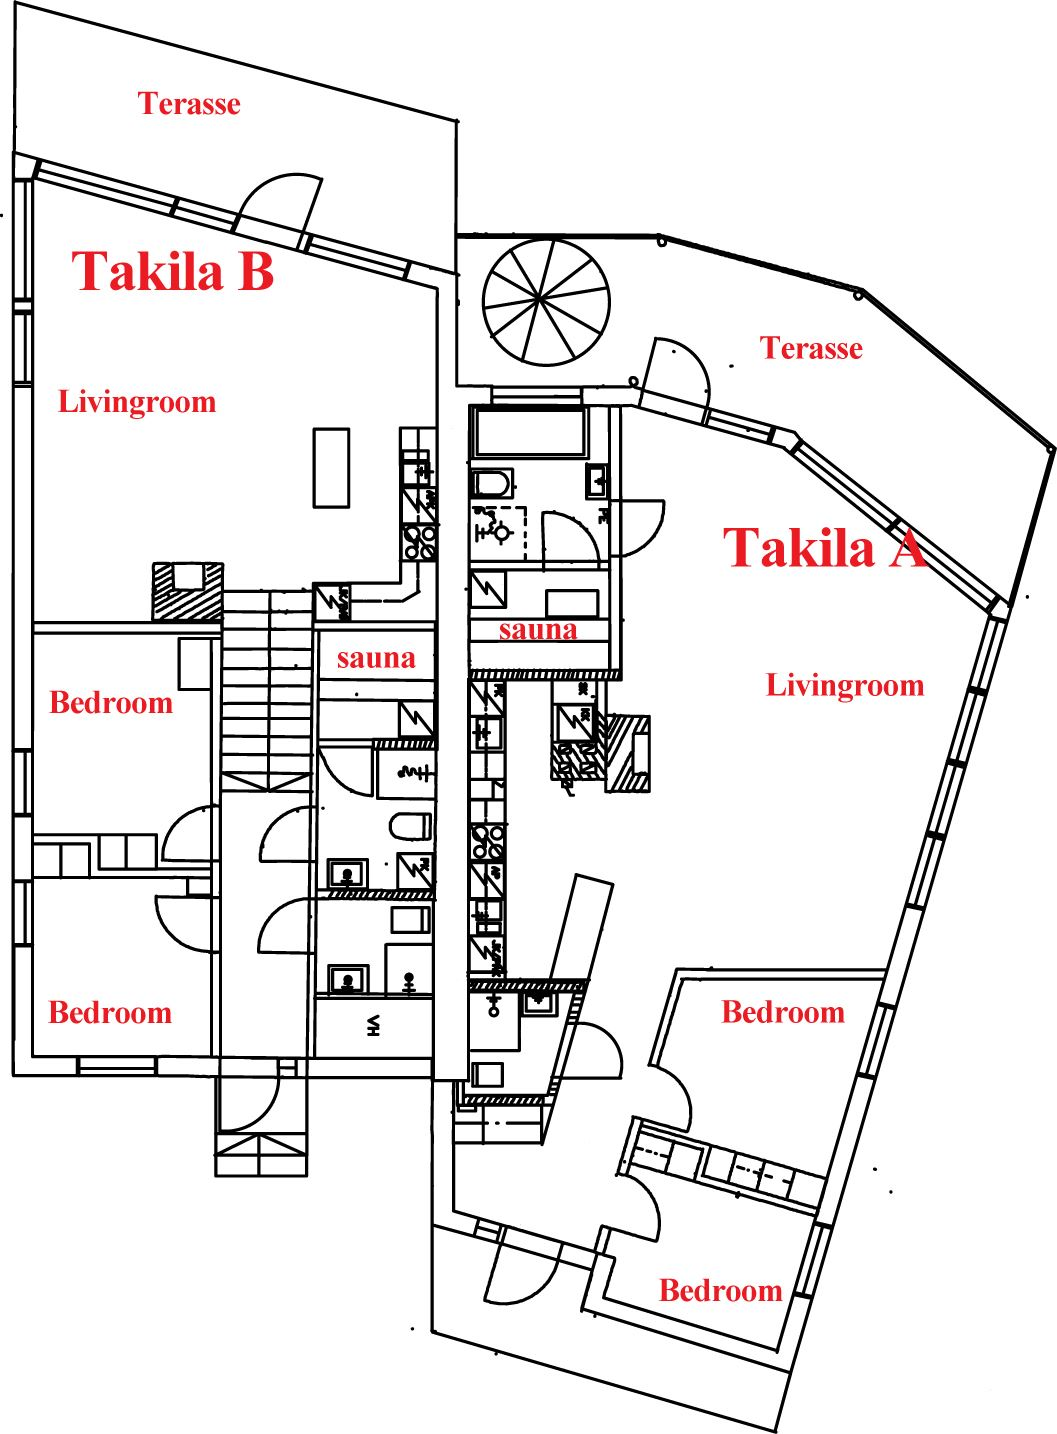 Villa Takila A 8+2 hengelle | Forlake Oy